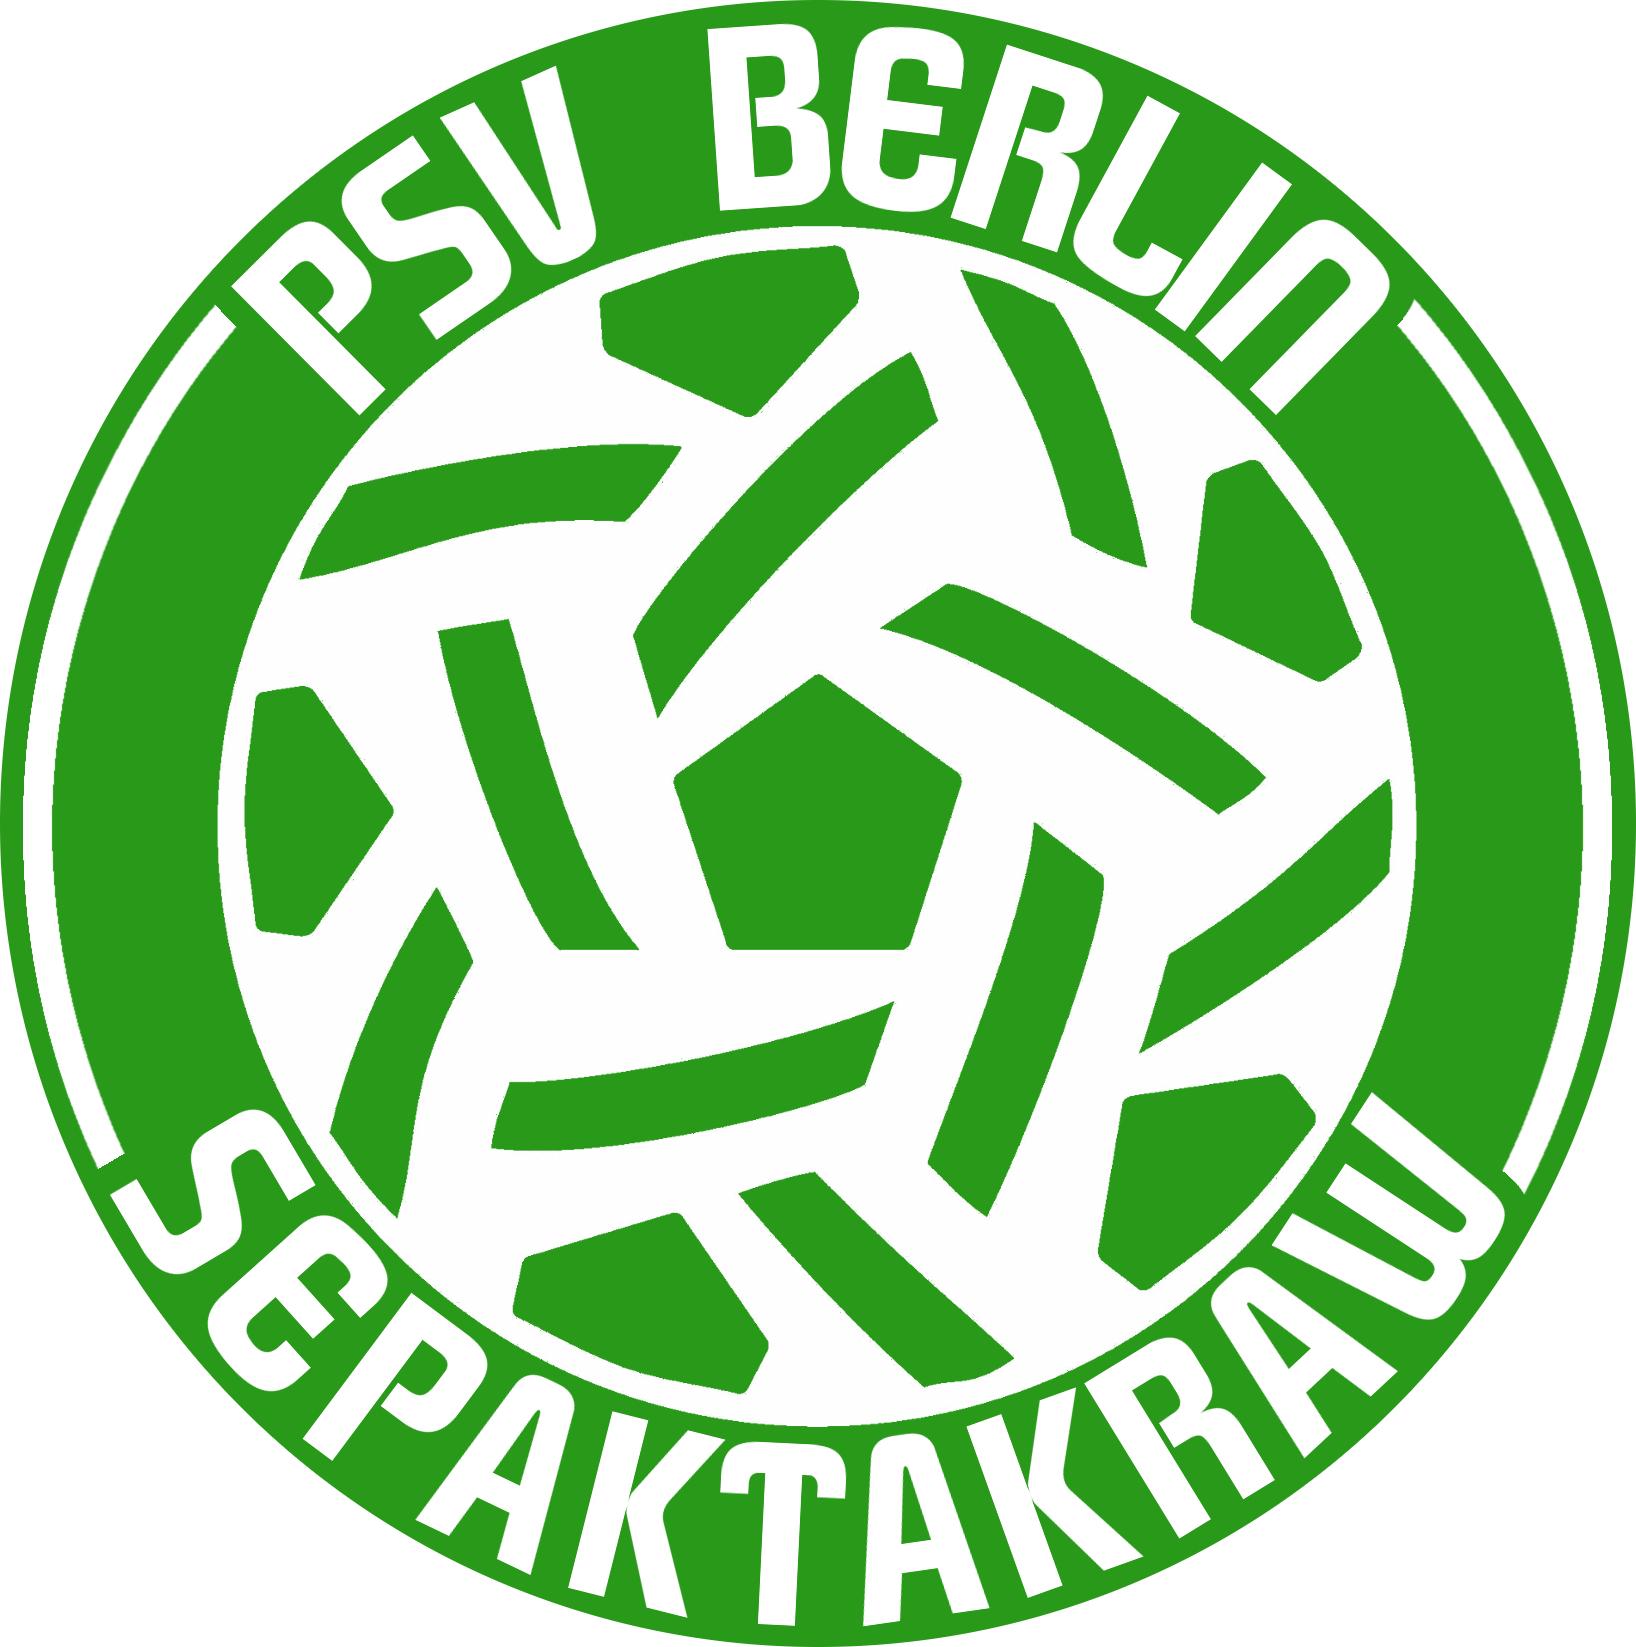 PSV Takraw Berlin